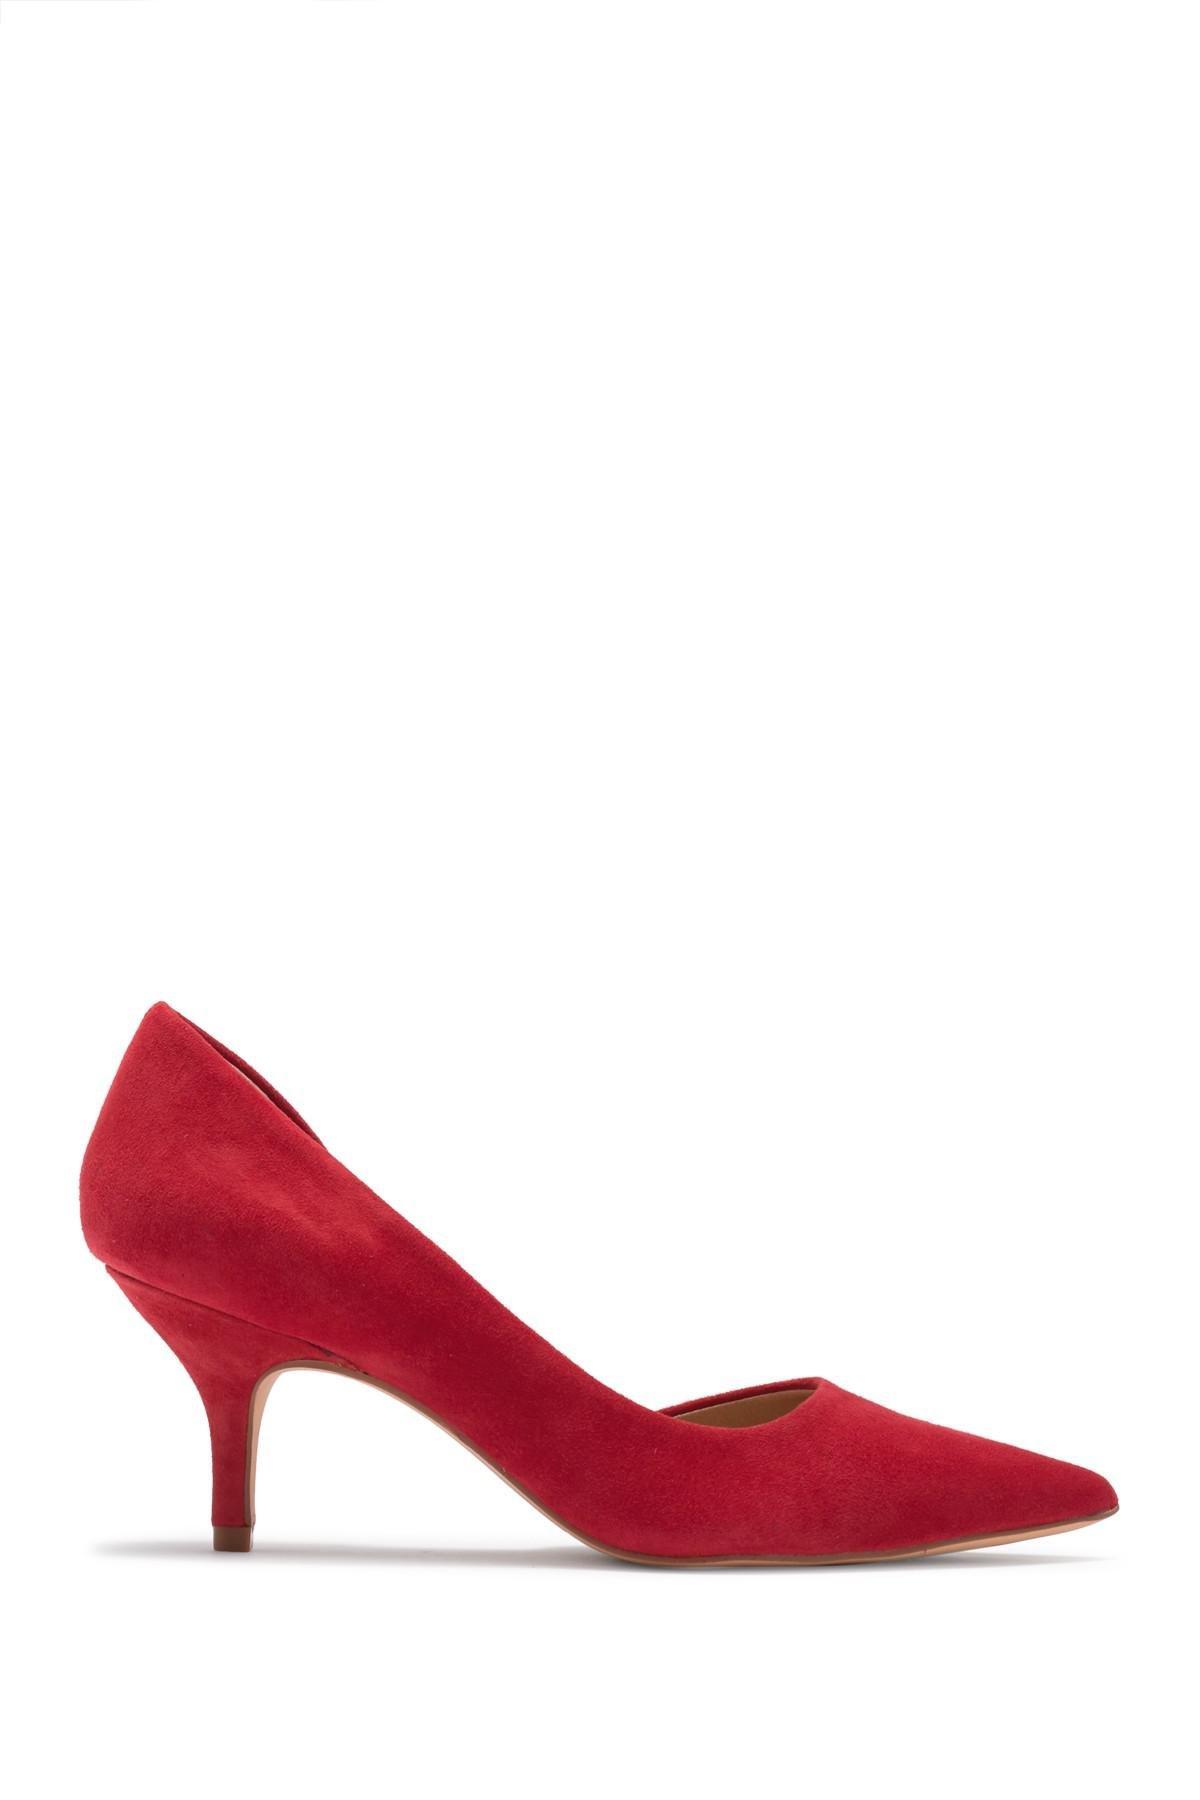 09cb791001b Lyst - Steve Madden Flory Suede Kitten Heel Pump in Red